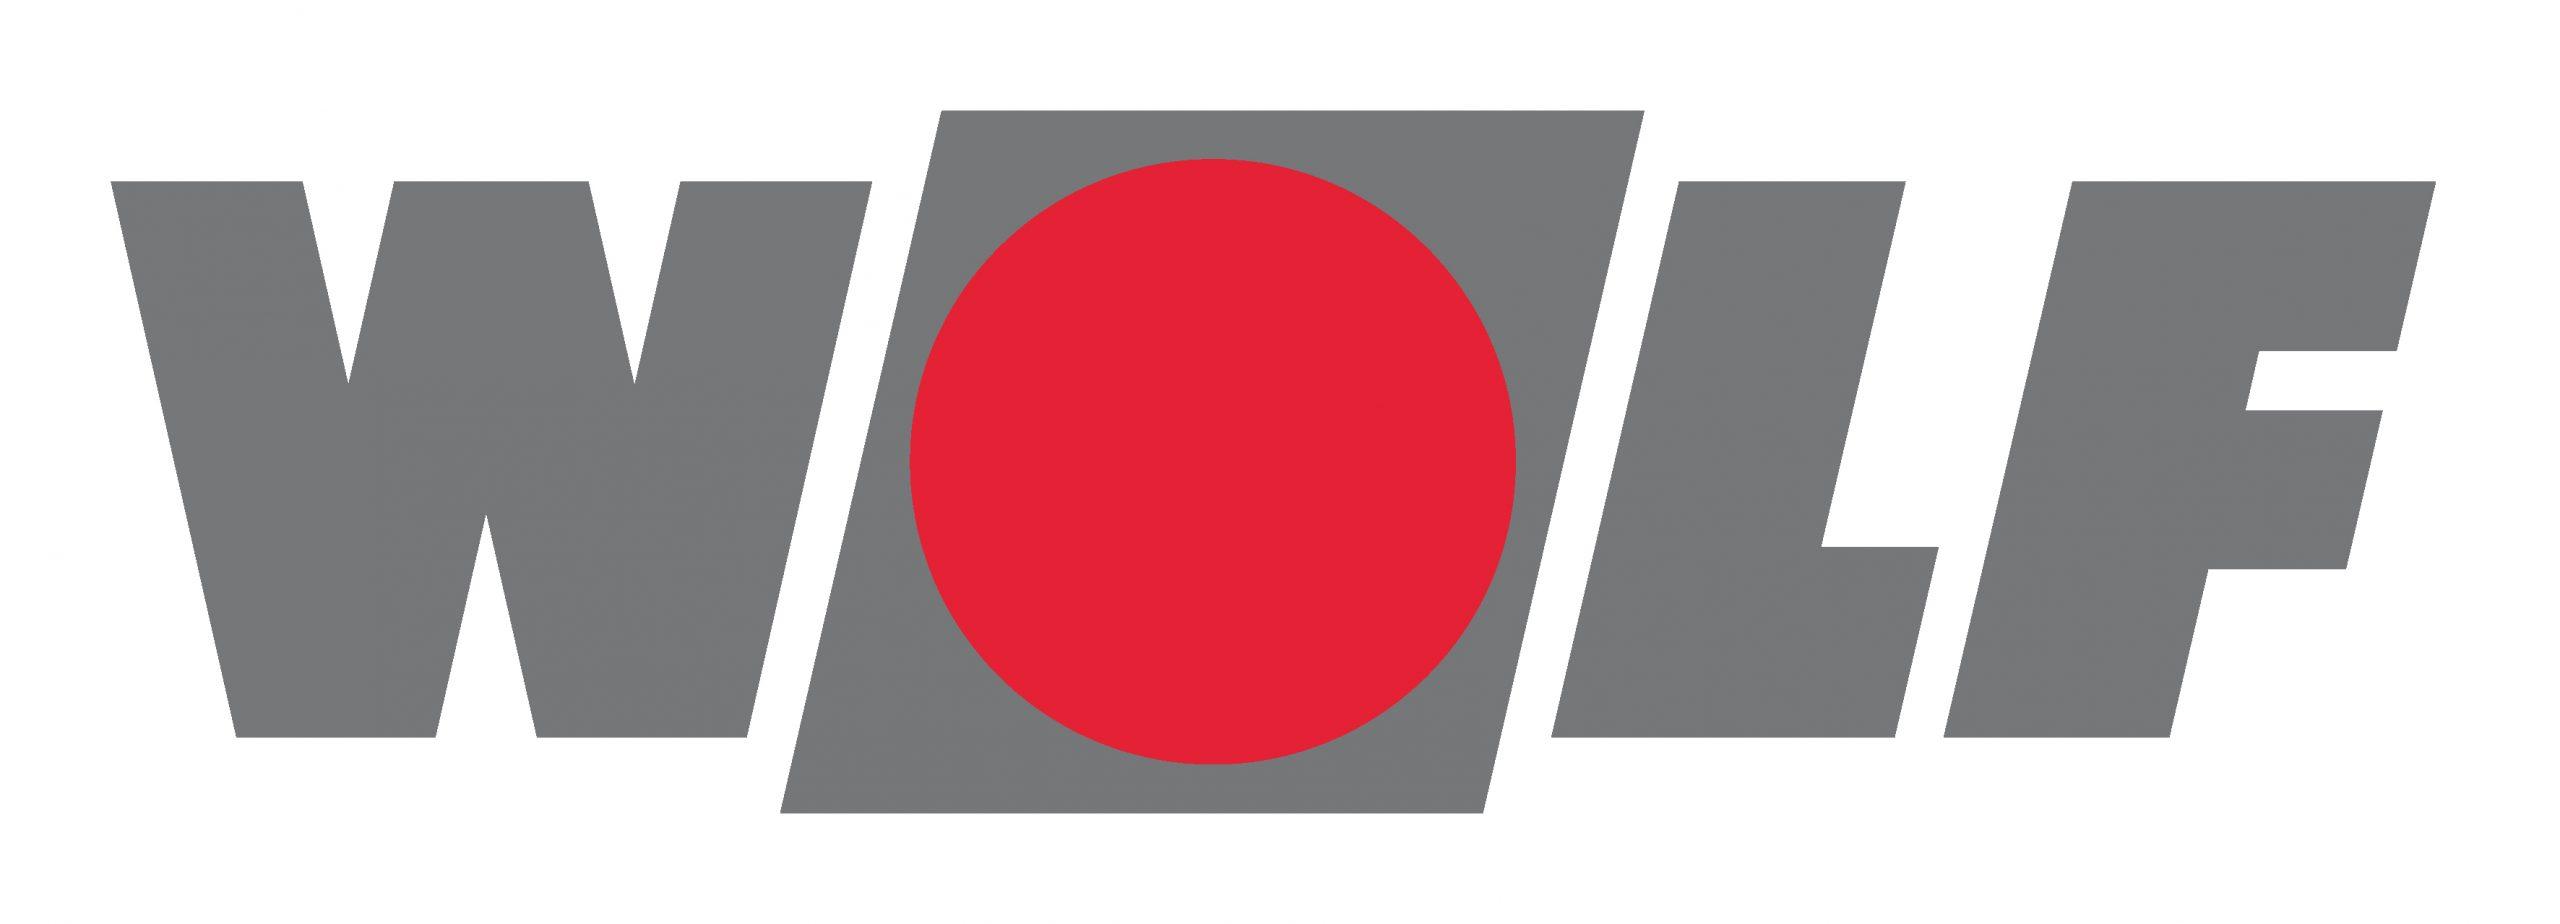 WOLF_Logo_4c_black_red